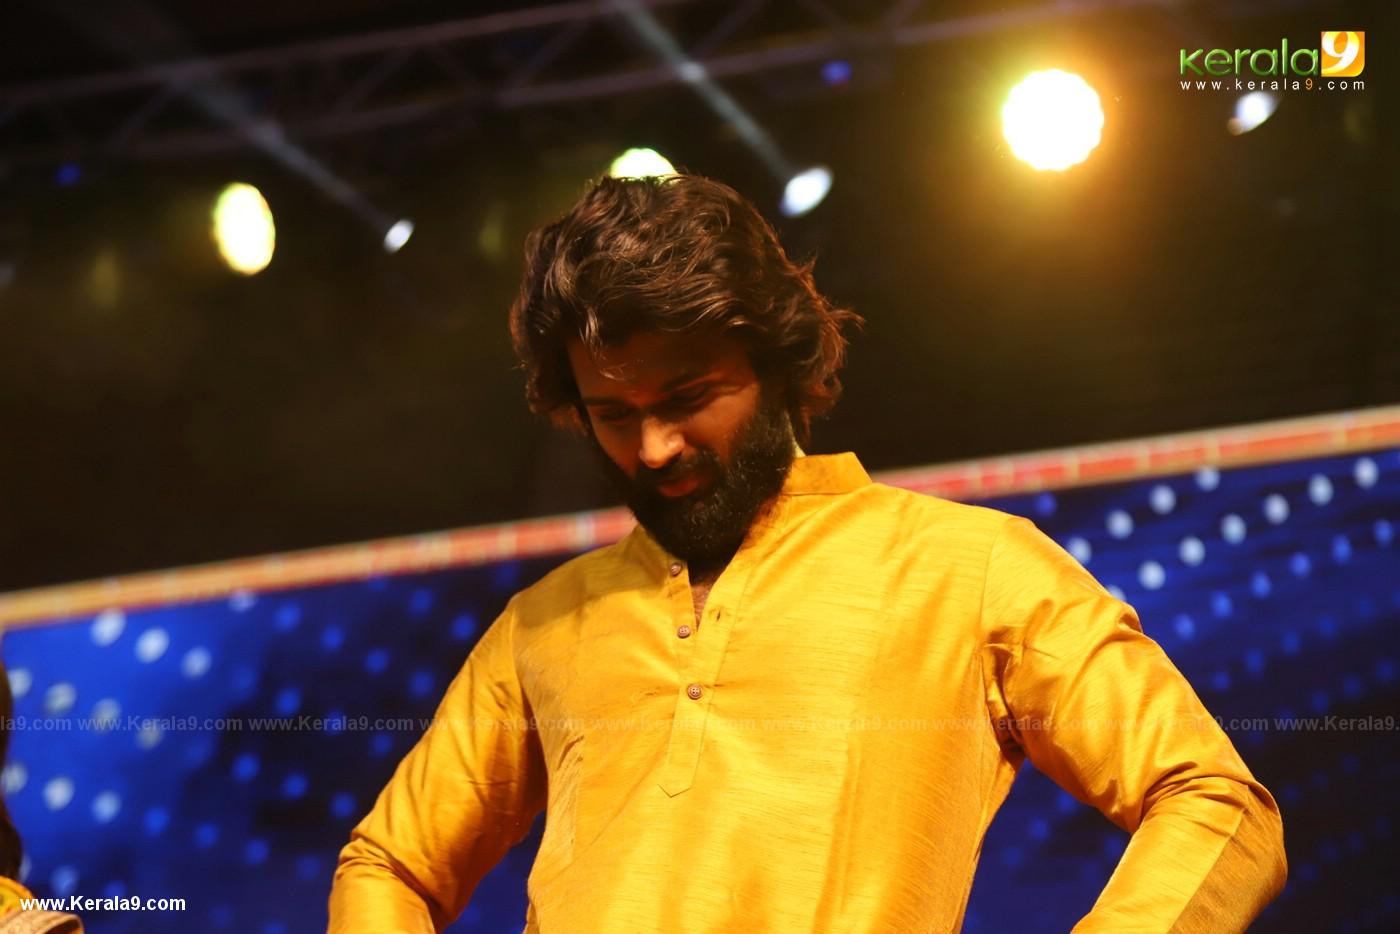 Dear Comrade movie premotion kerala kochi photos 184 - Kerala9.com